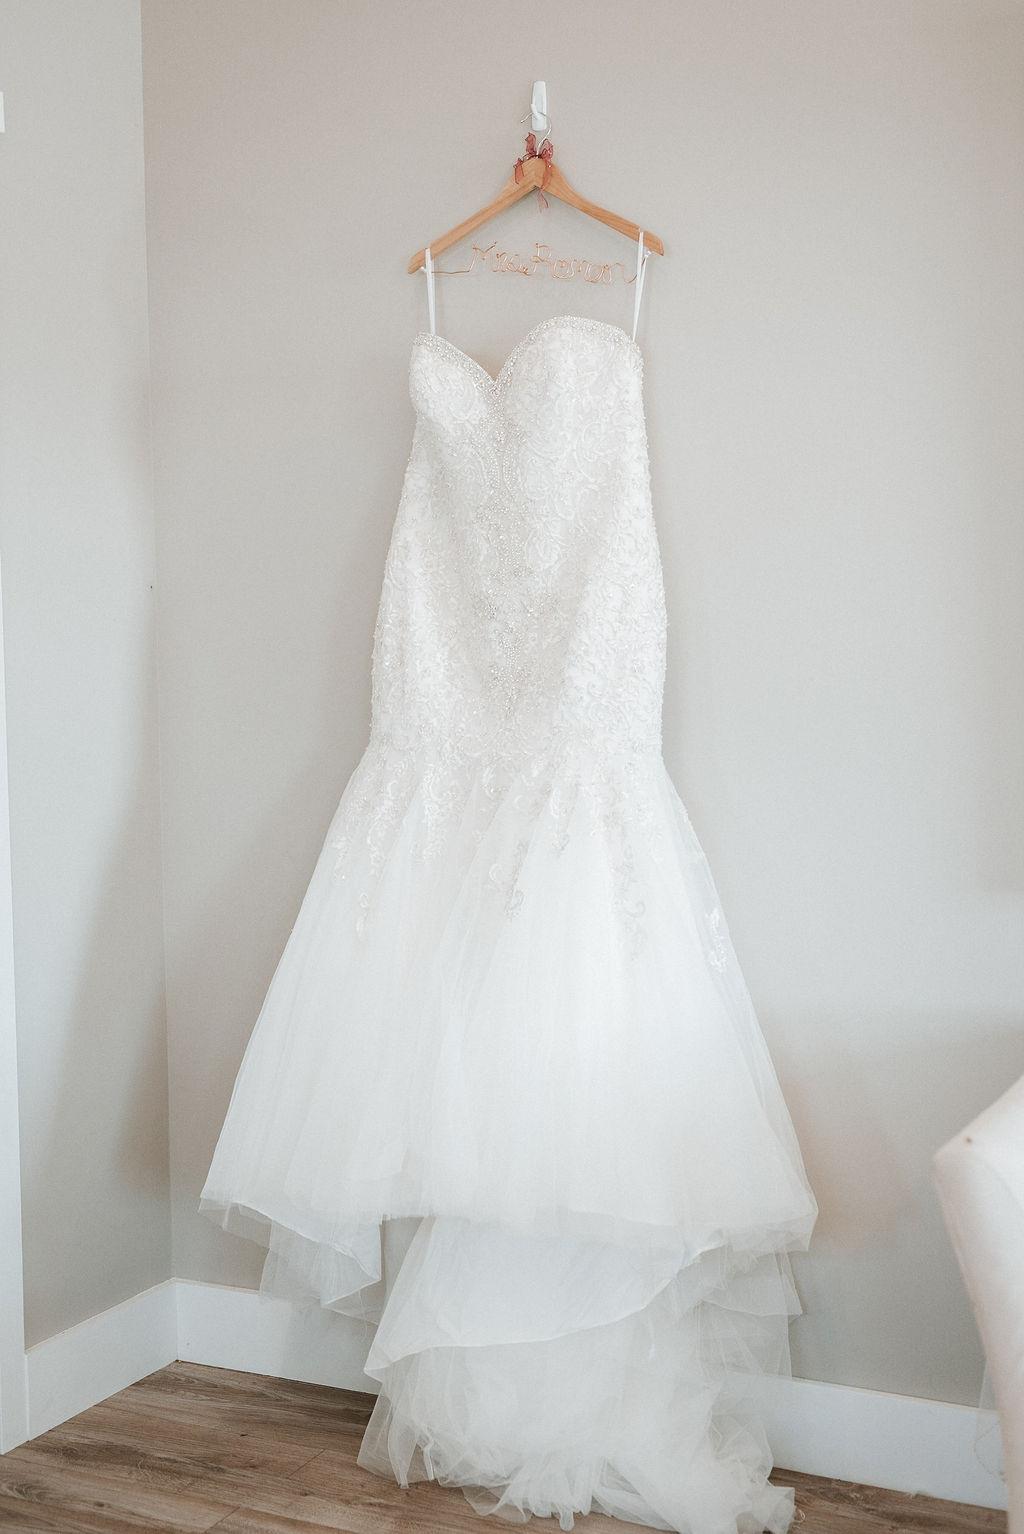 Detail Shot of Bride's Wedding Dress at Blue Valley Vineyard